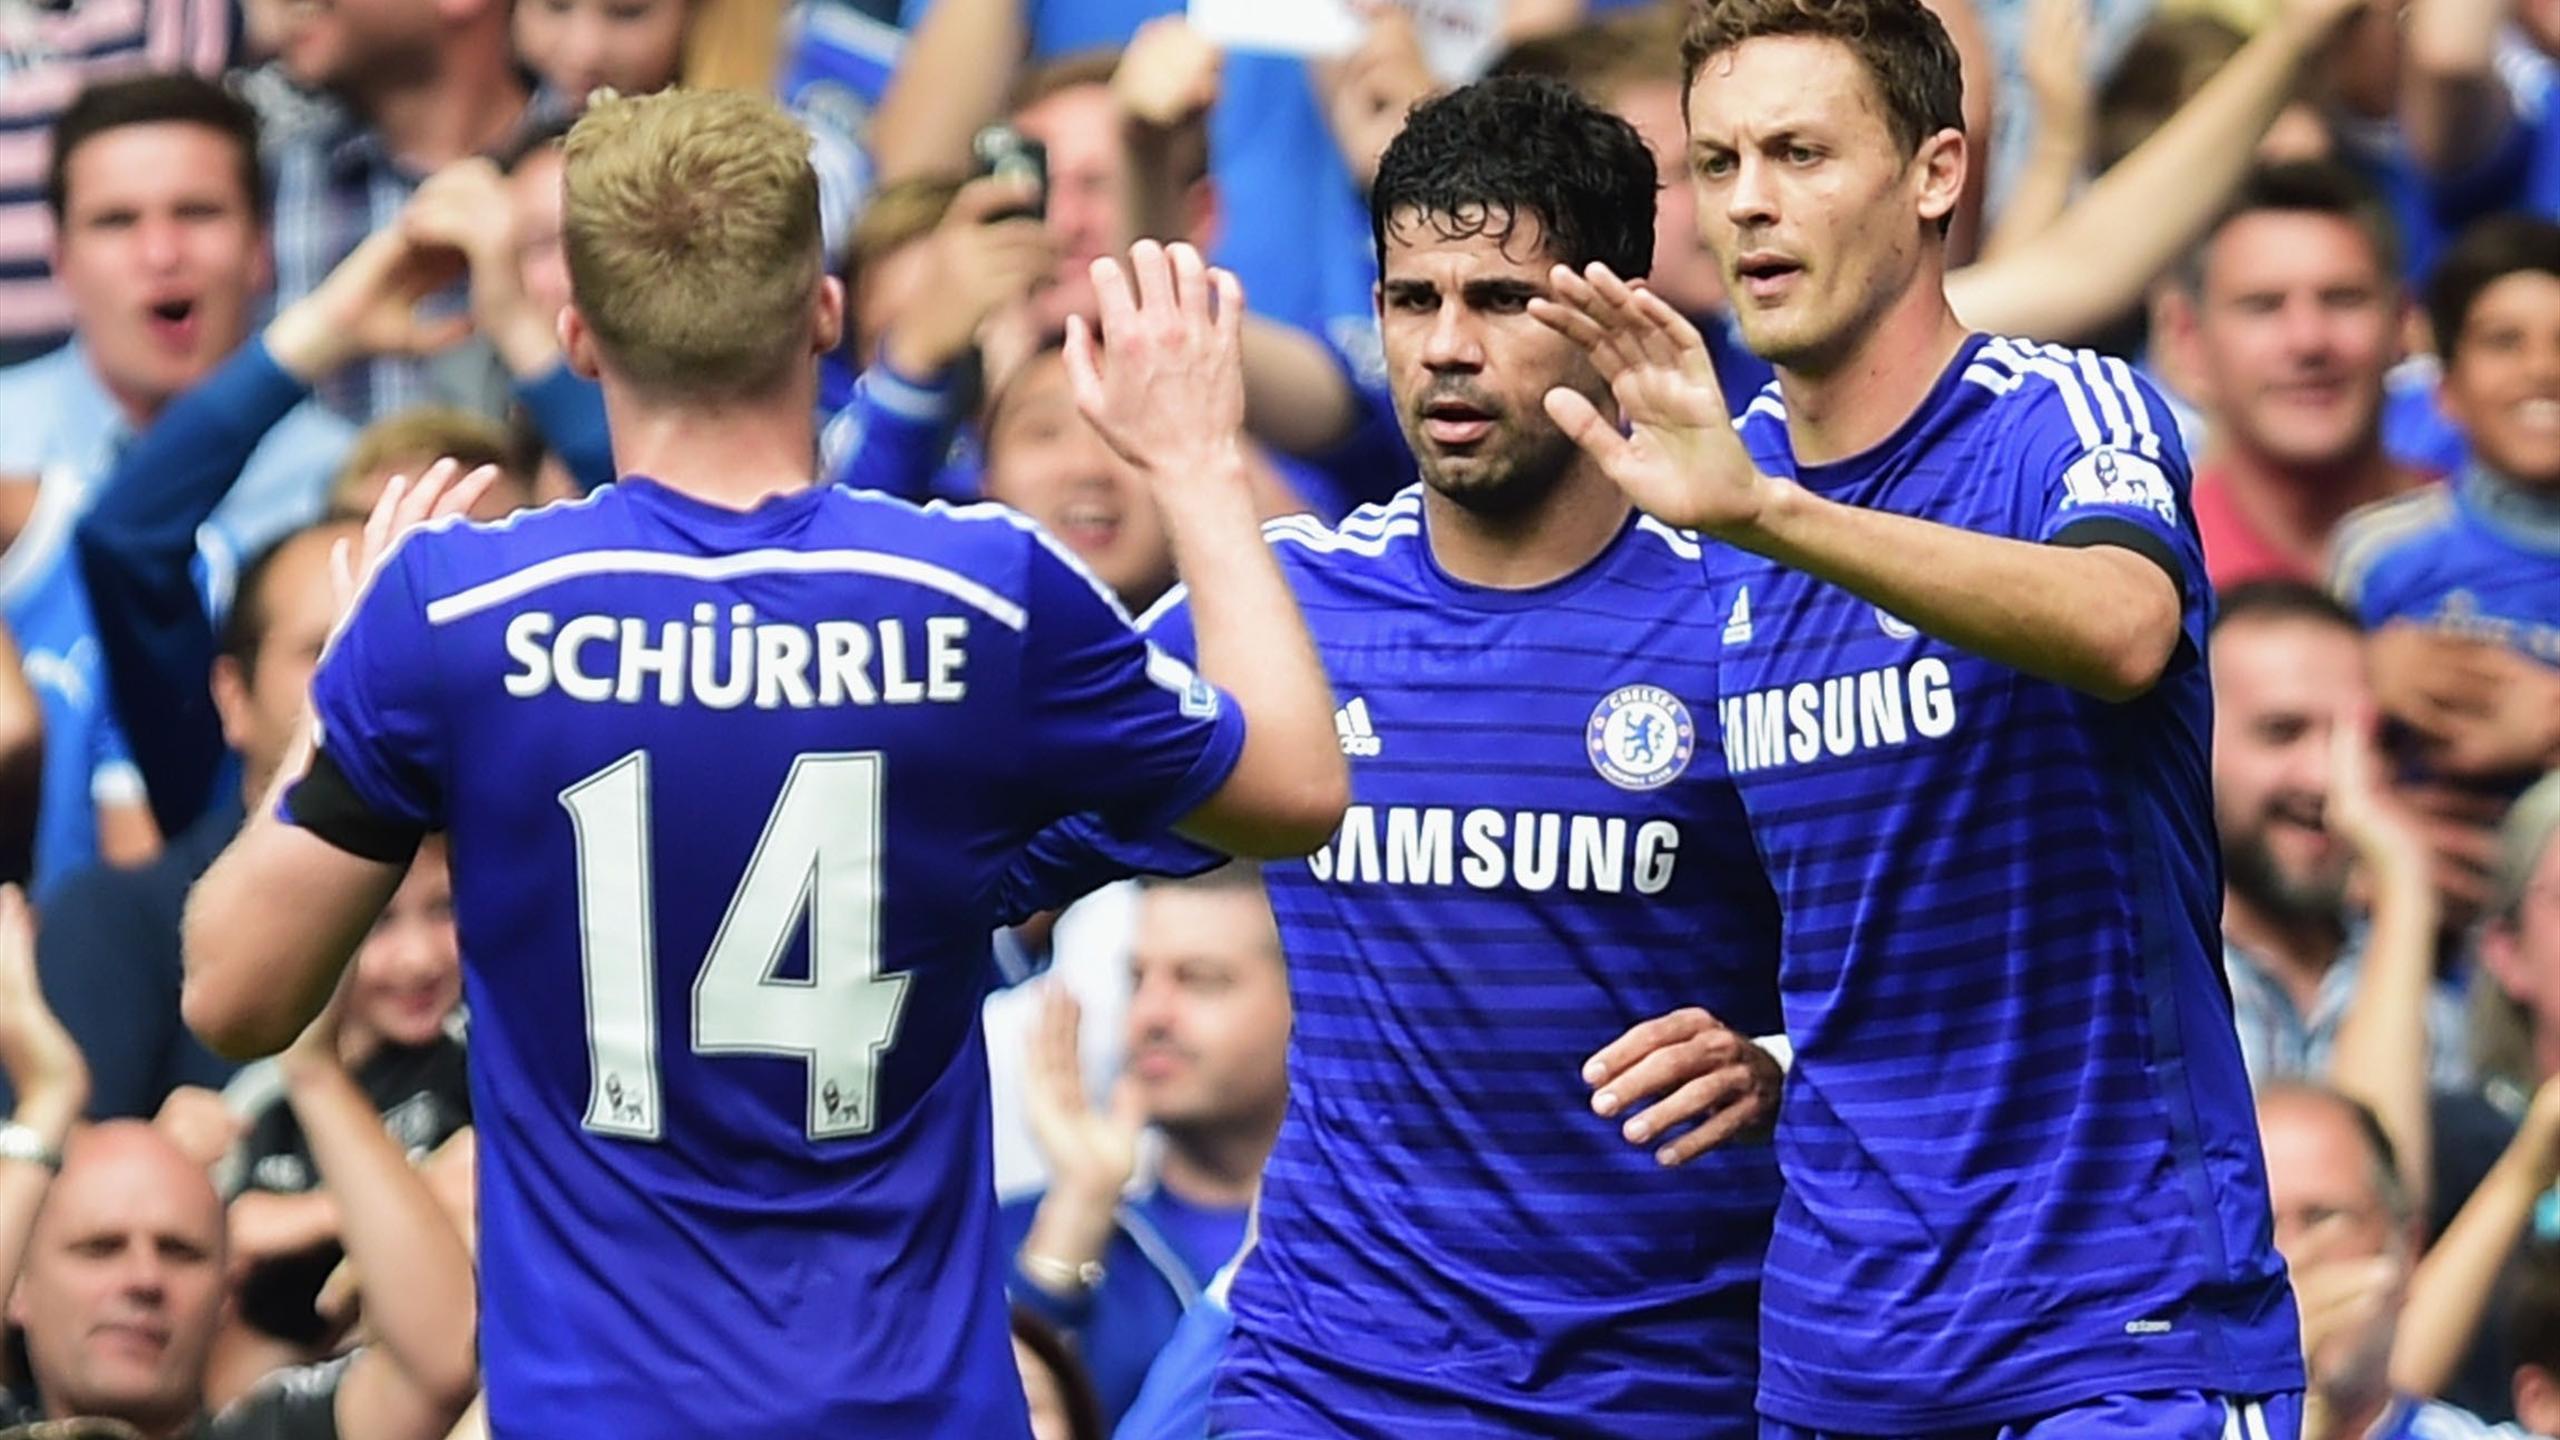 Match Sporting Lisbonne vs Chelsea en direct streaming live